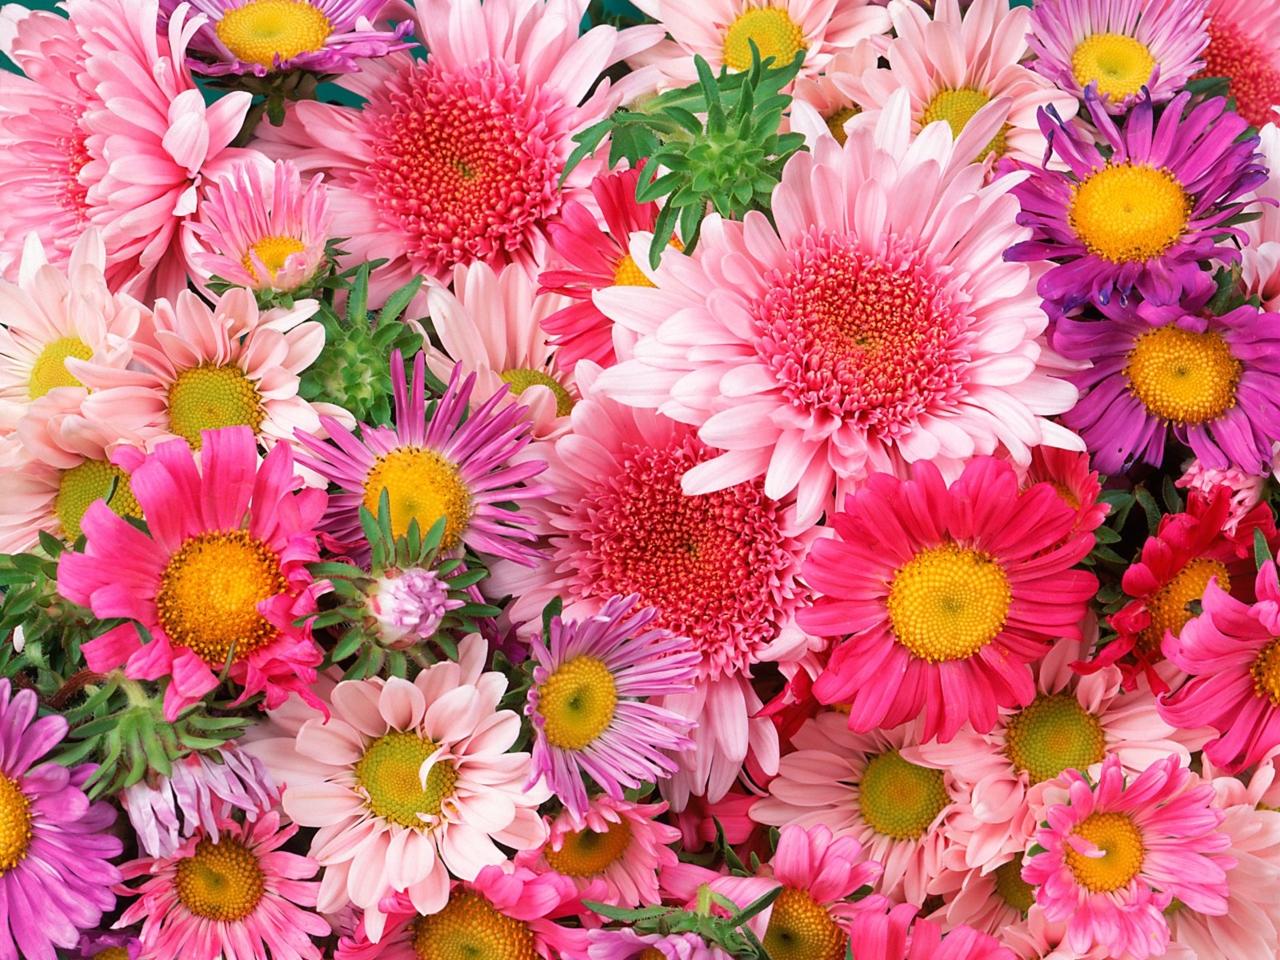 flowers 3bfb31ff